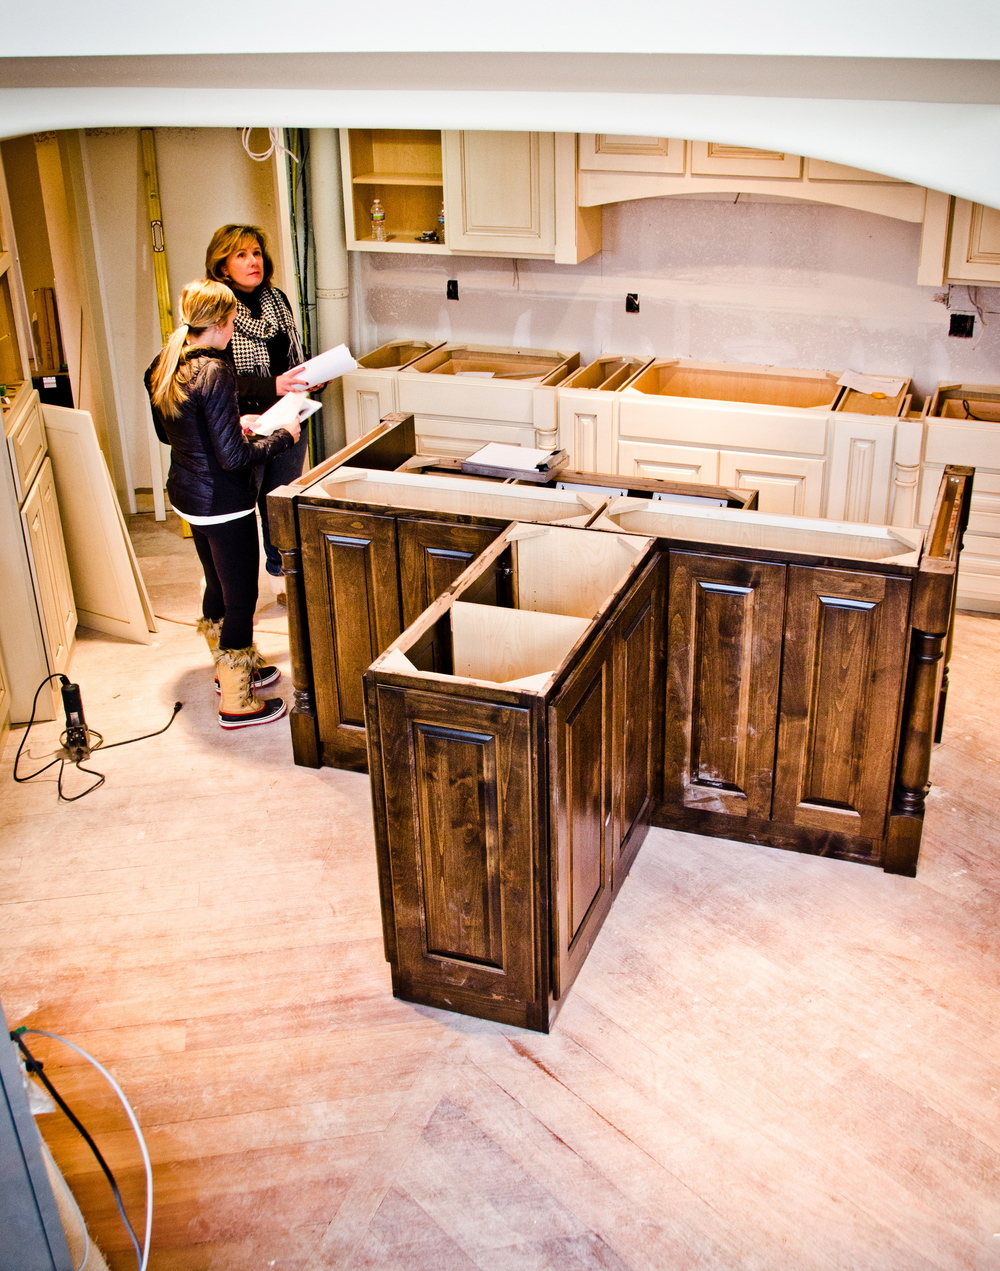 328 Design Group construction Parker kitchen cabinets